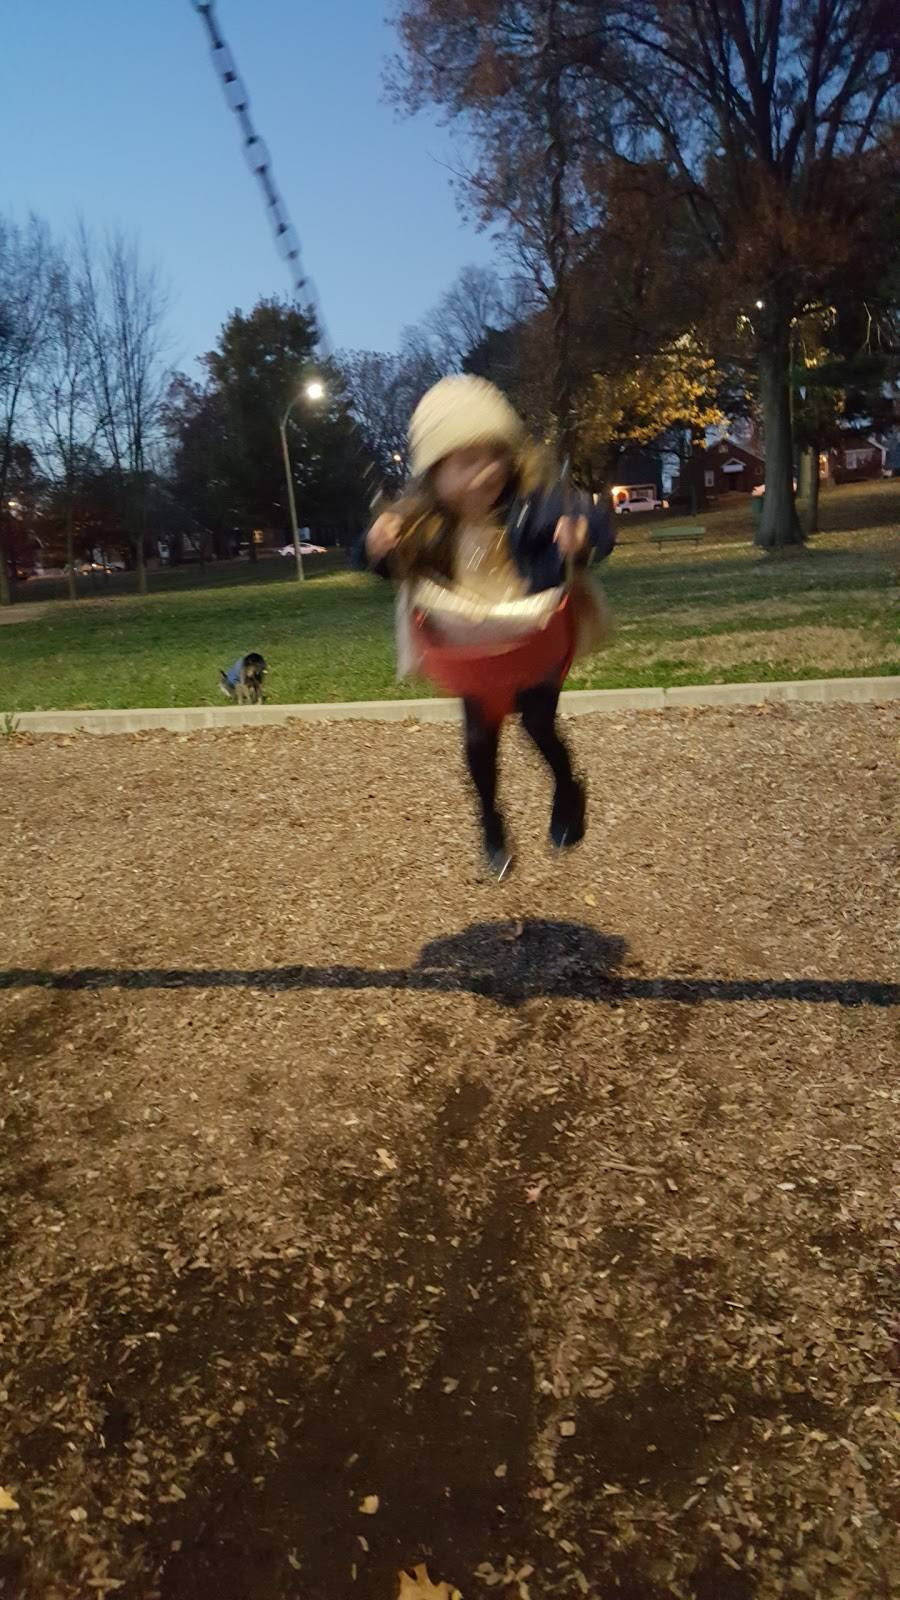 Lindenwood Park - park  | Photo 4 of 10 | Address: Pernod Ave & Jamieson Avenue, St. Louis, MO 63139, USA | Phone: (314) 622-4800